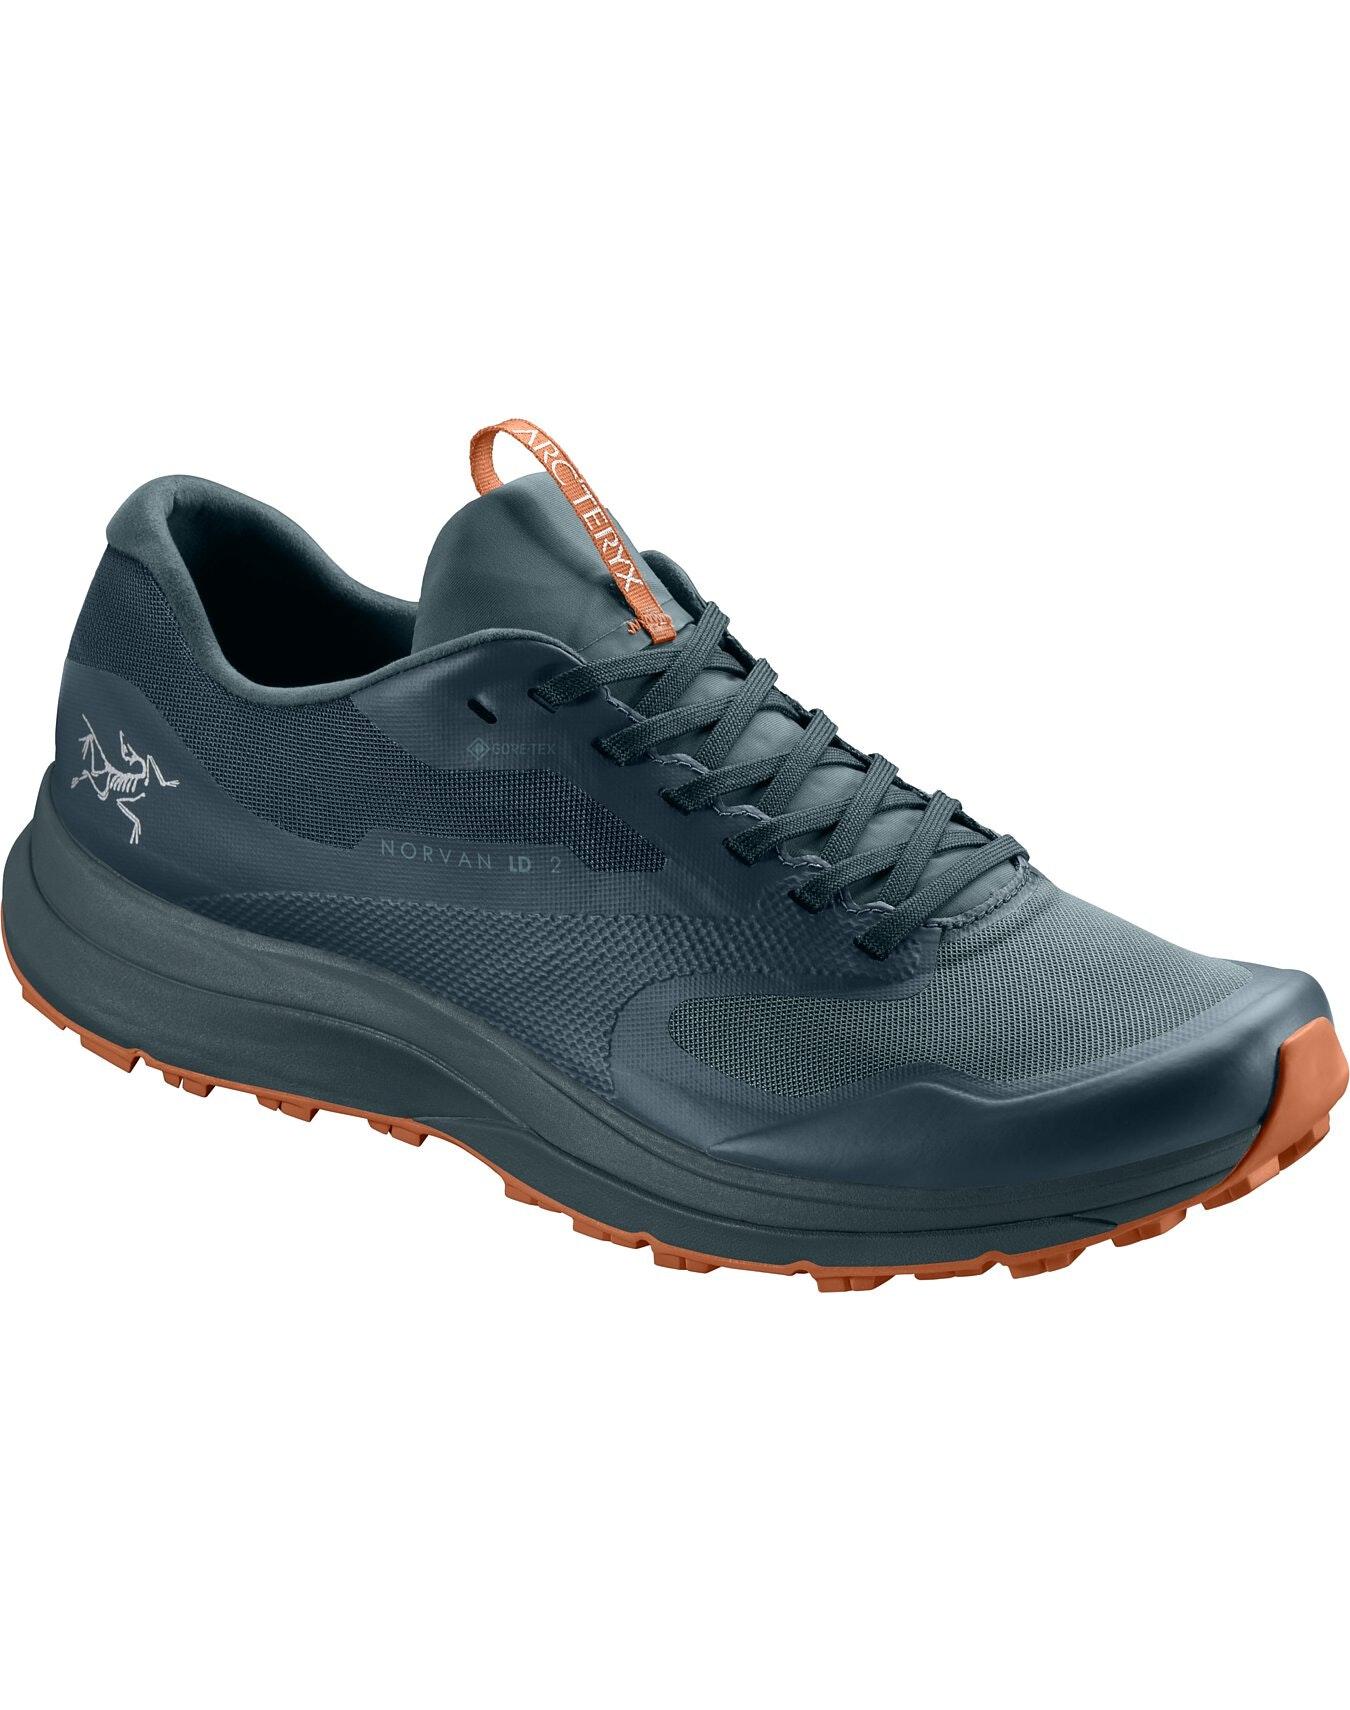 Norvan LD 2 GTX Shoe ASTRAL/Solus